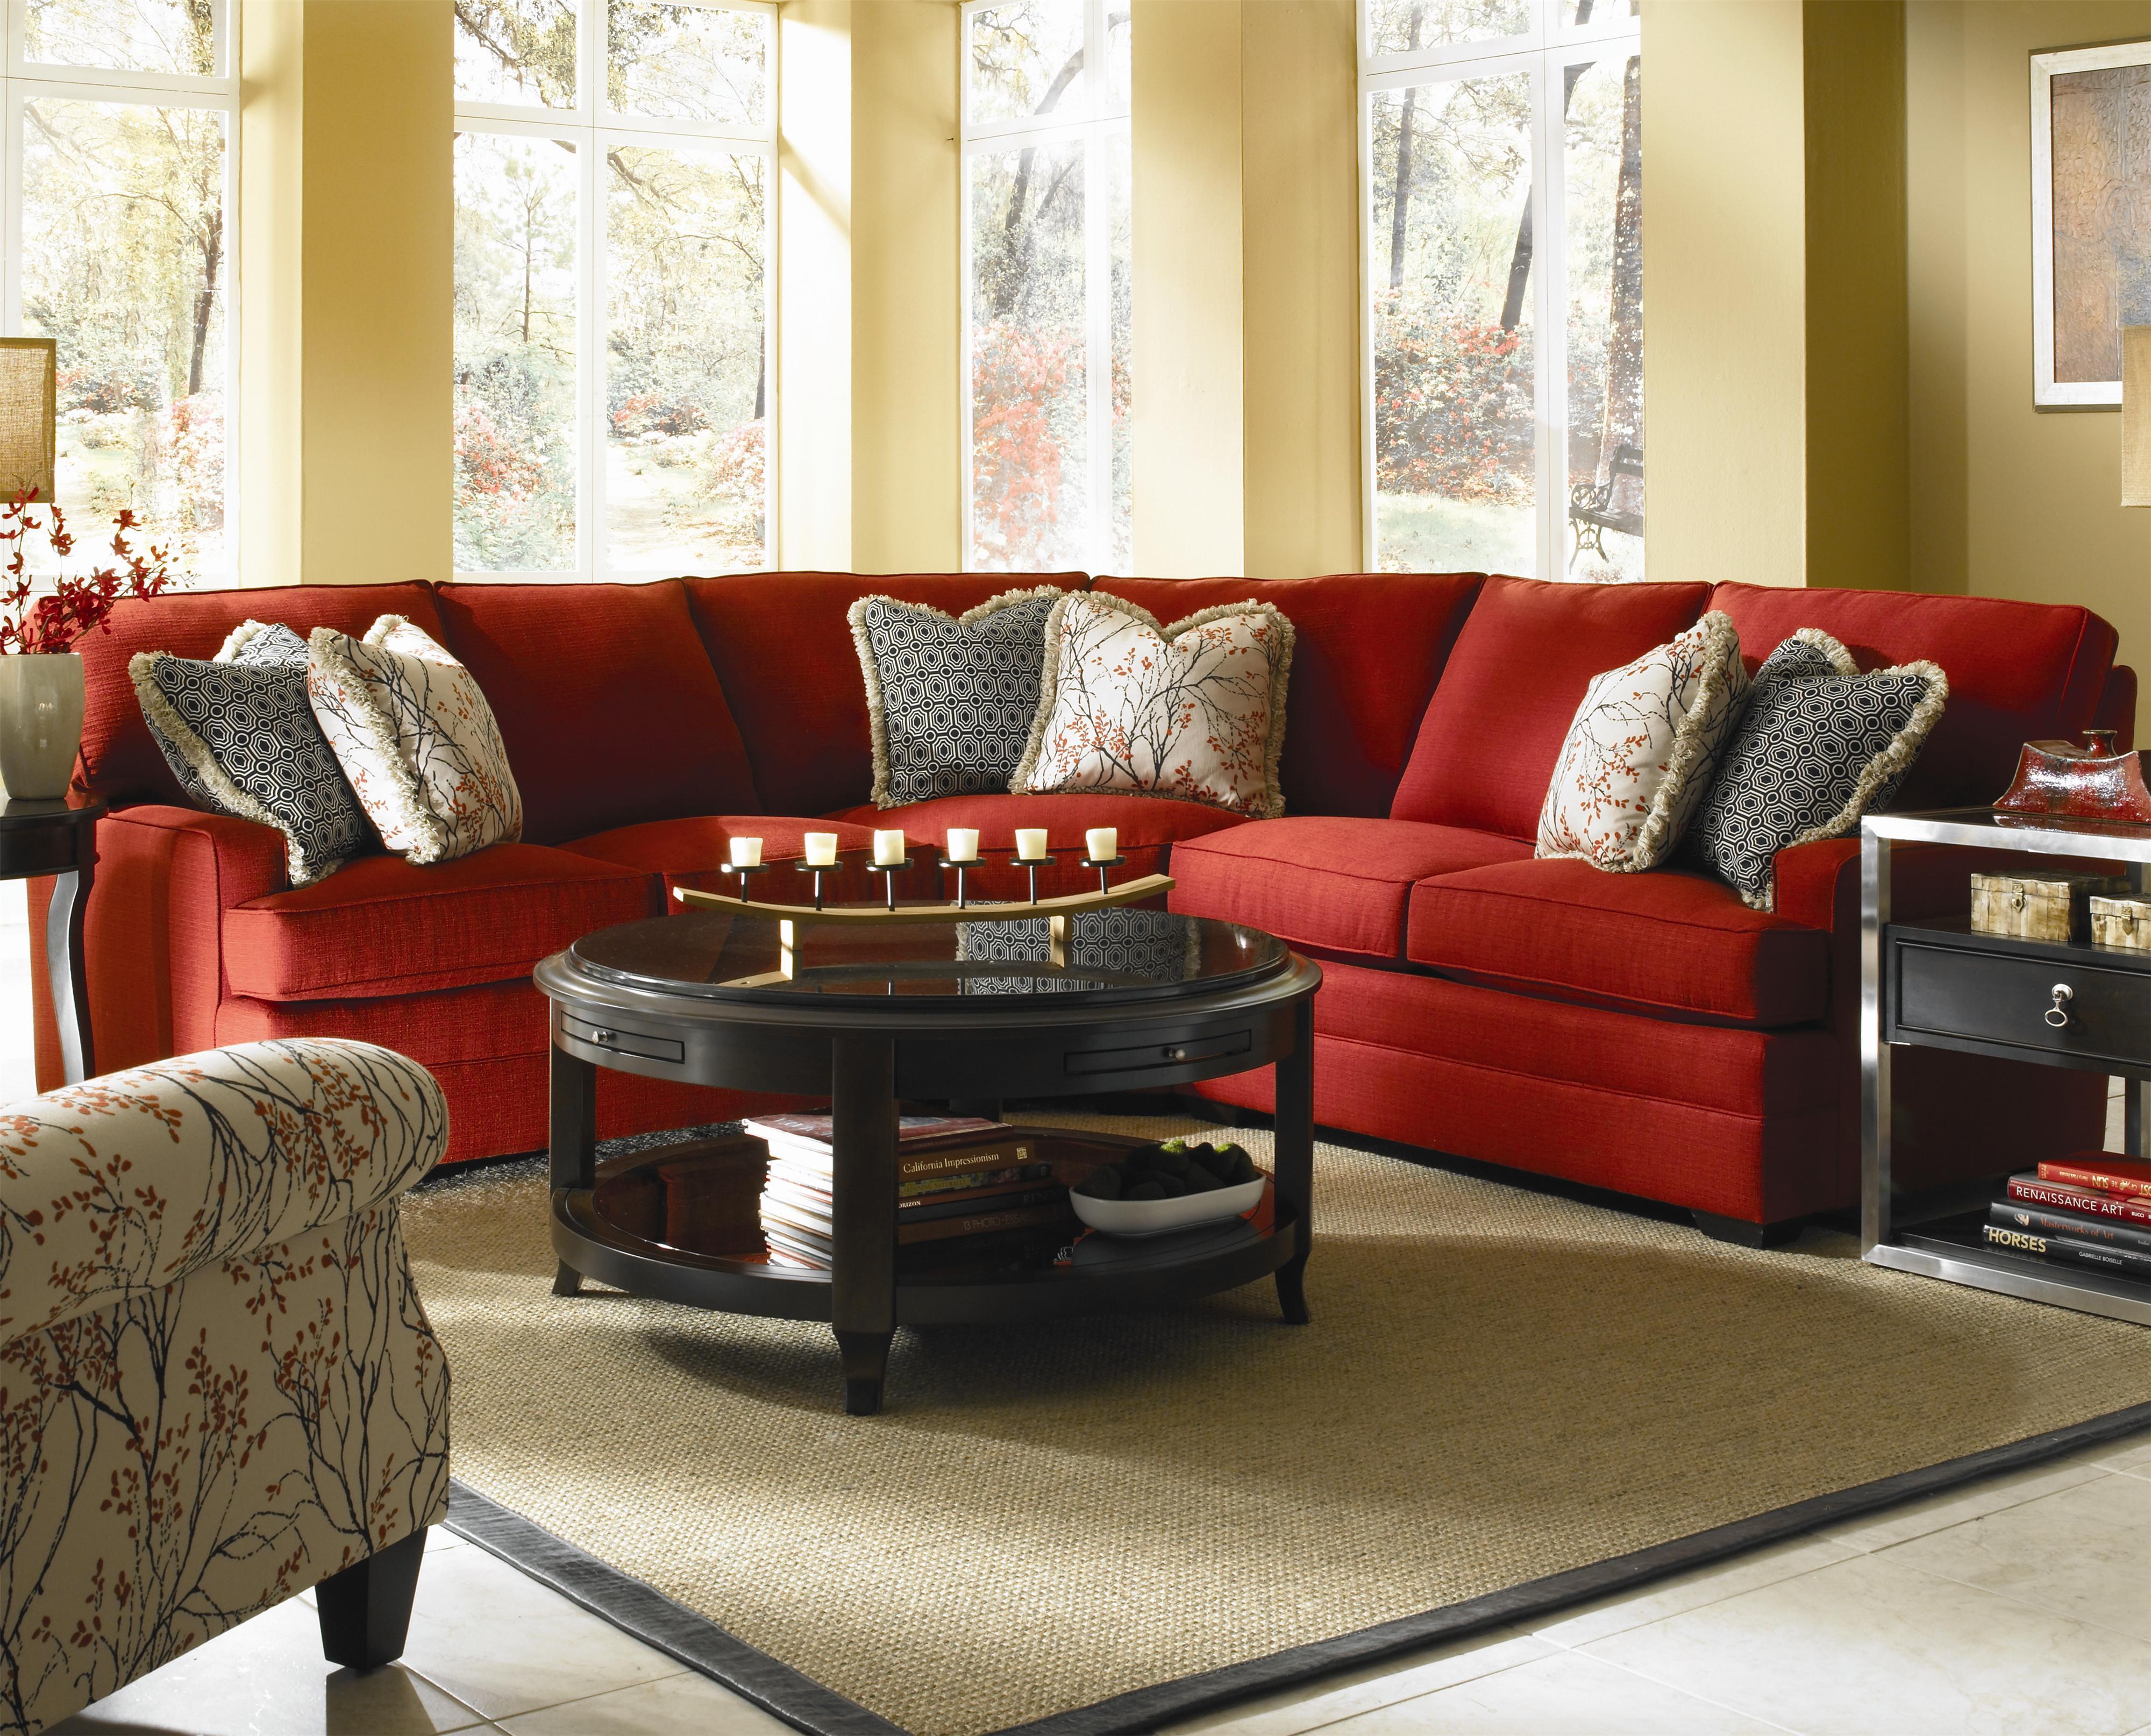 Custom Select Upholstery Custom 3 Piece Sectional Sofa By Kincaid Furniture